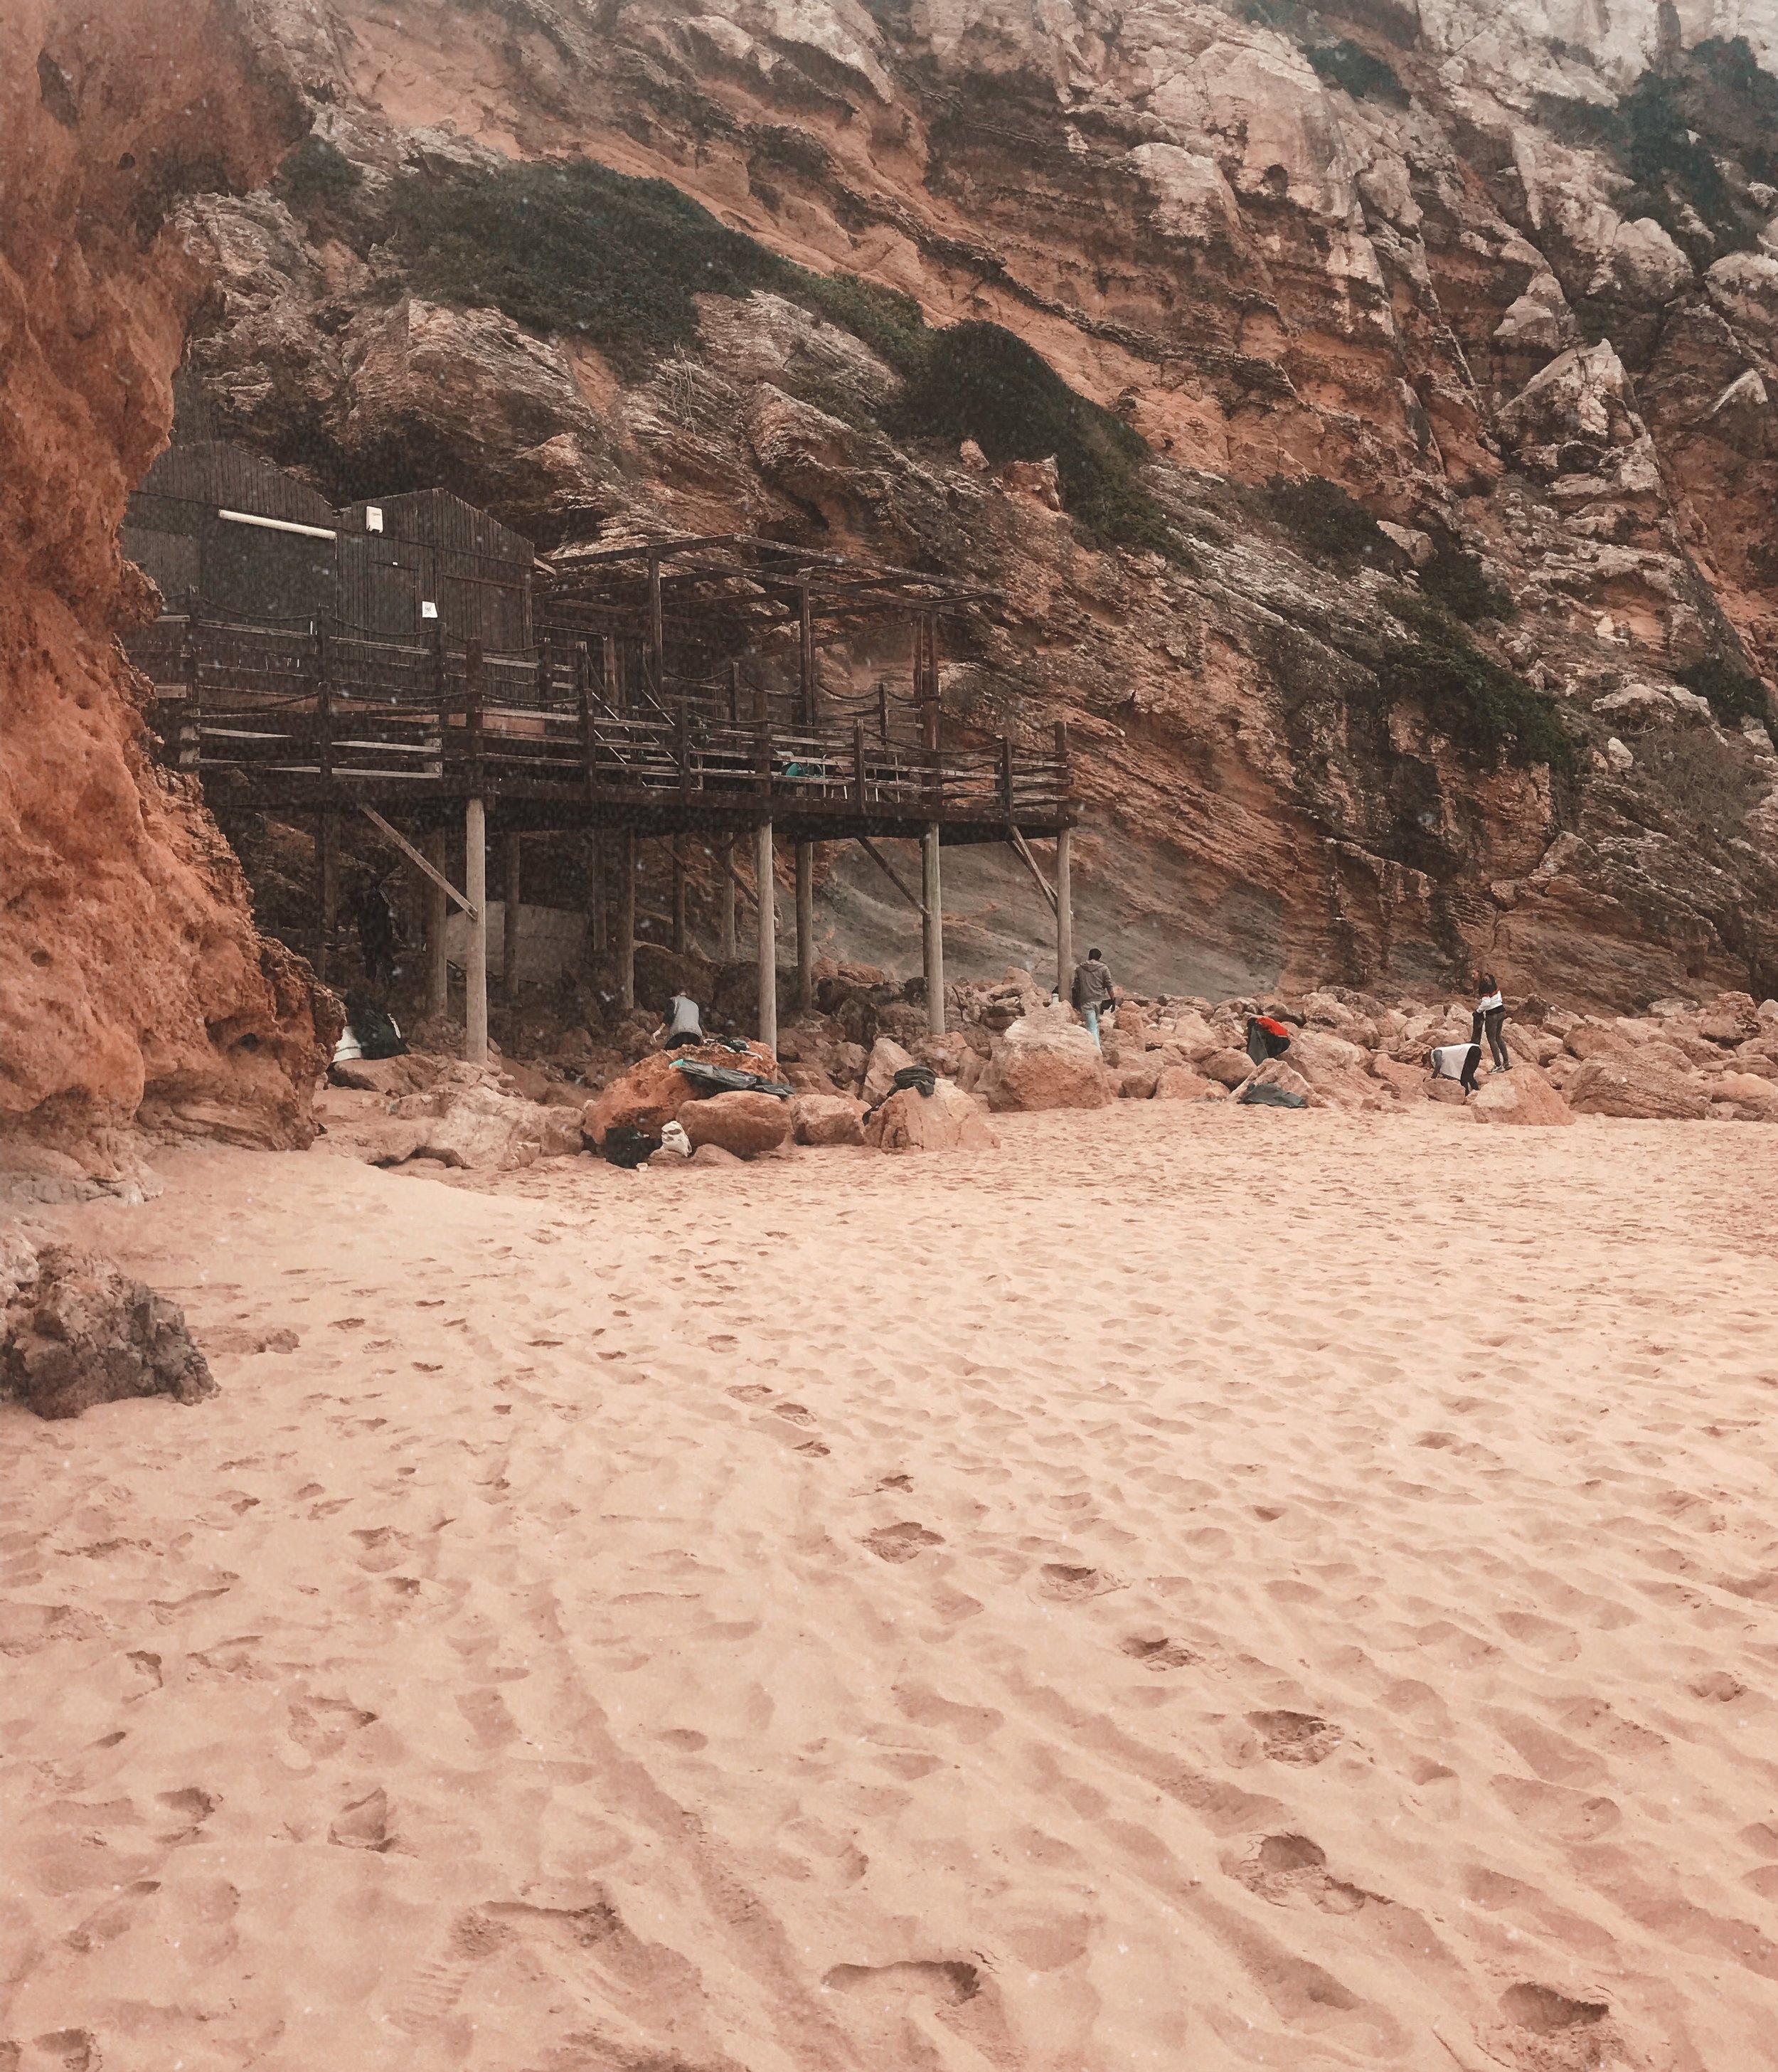 surfing algarve beach clean ups